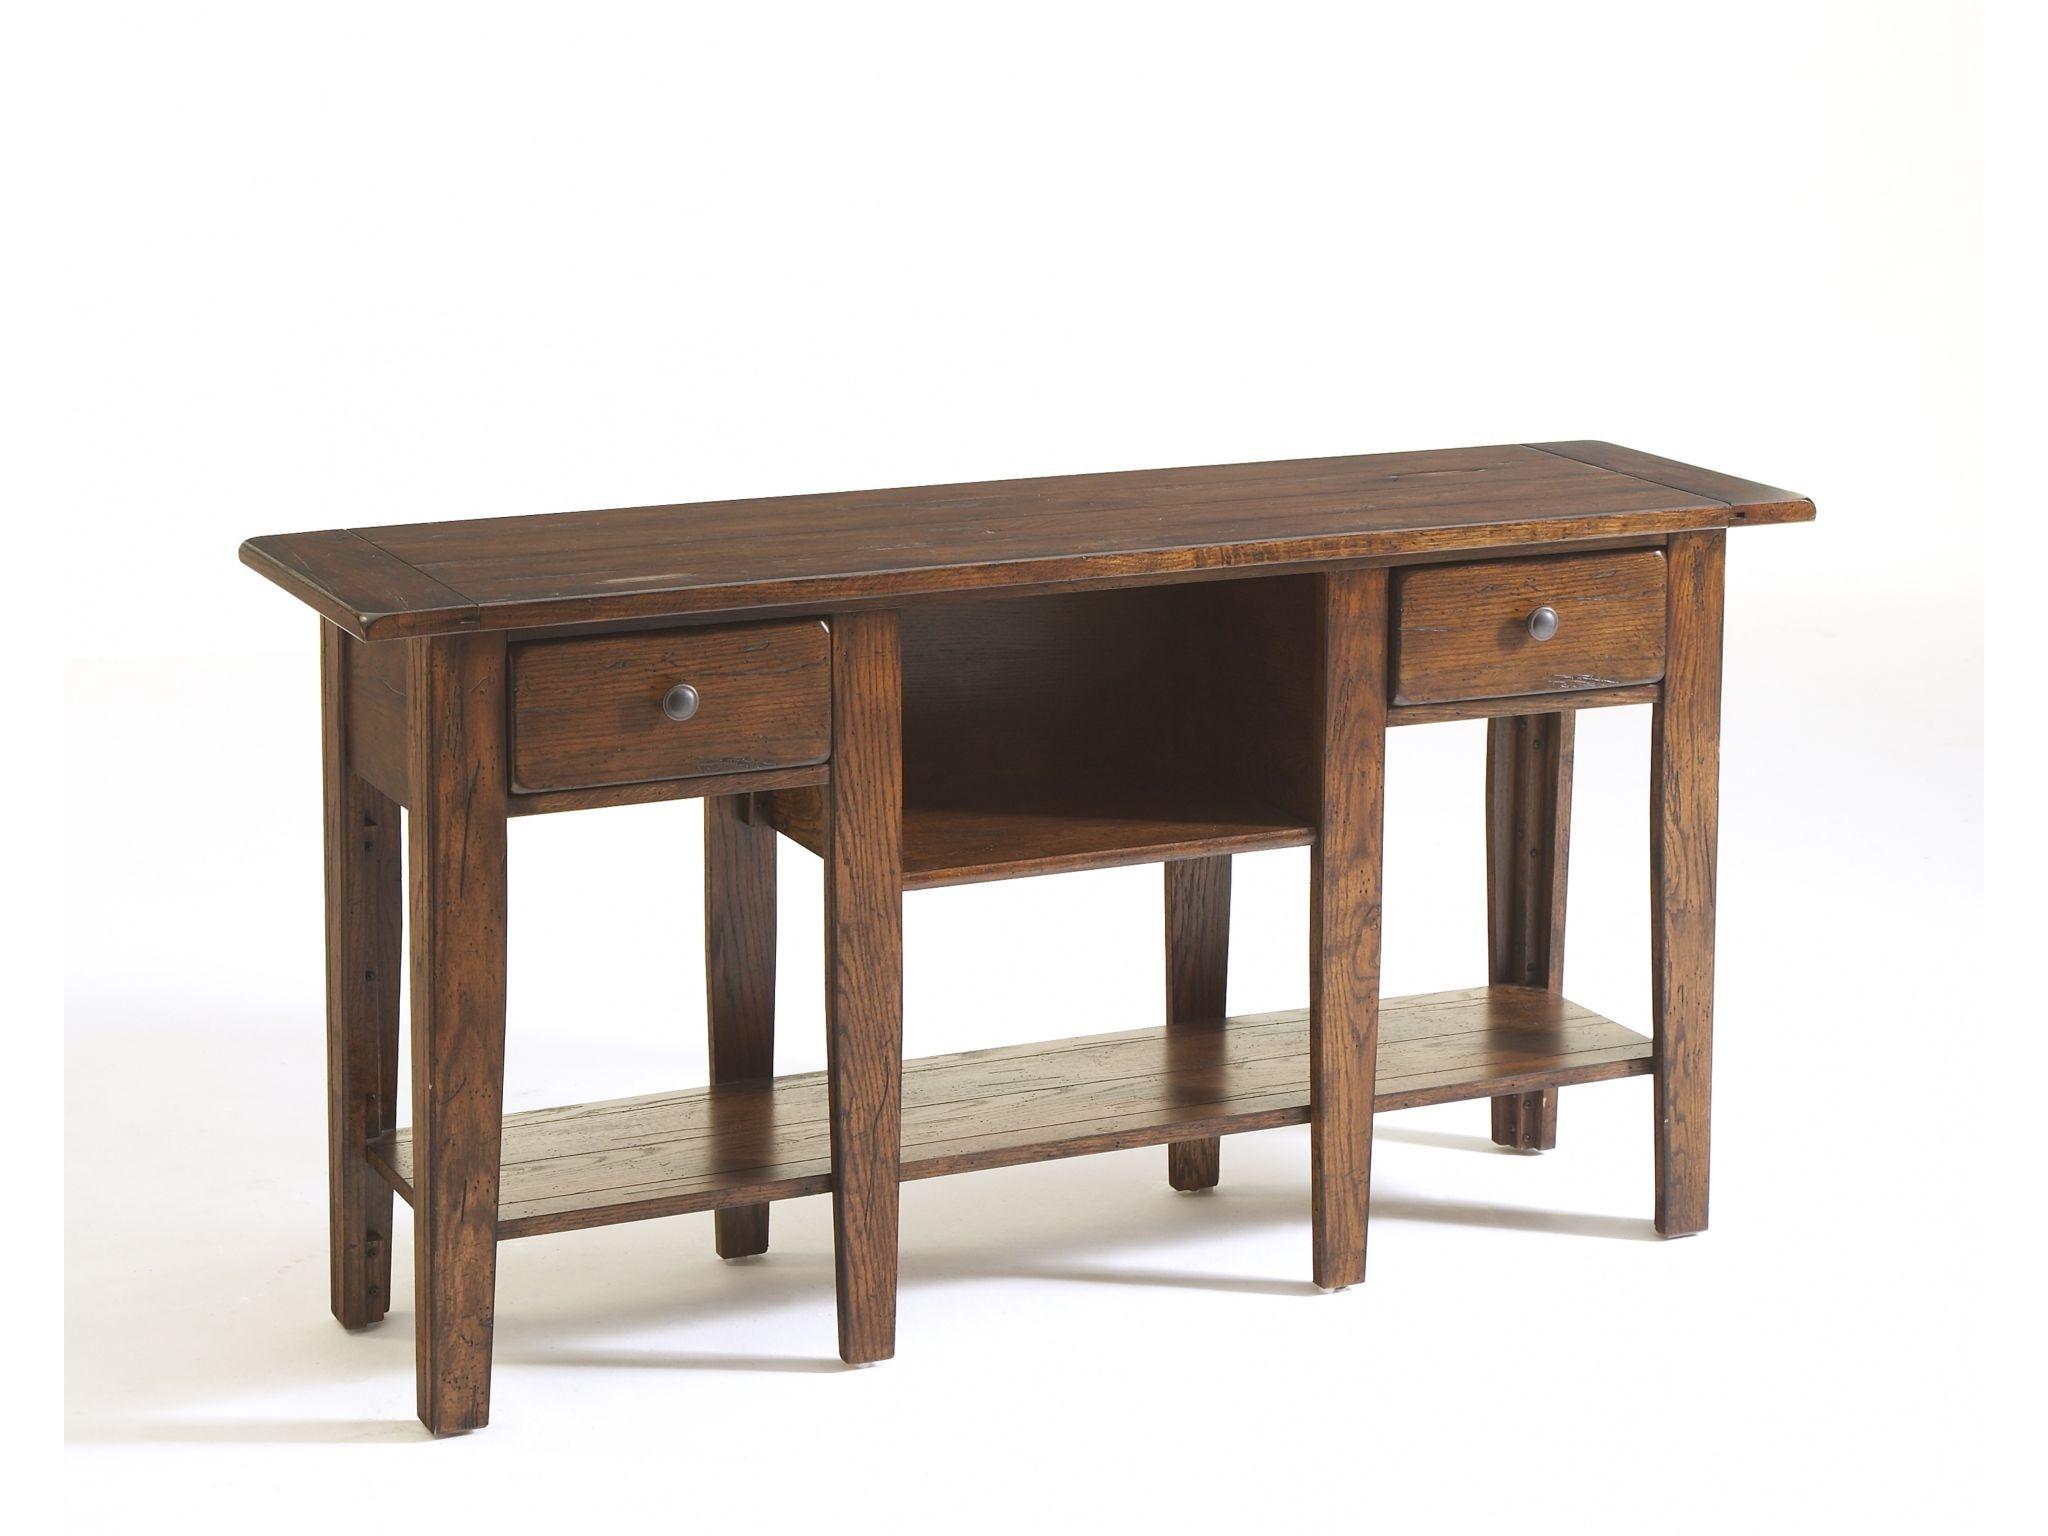 Broyhill Attic Heirlooms Sofa Table Rustic Oak 3399-09V  sc 1 st  Smokey Mountain Furniture & Broyhill Living Room Attic Heirlooms Sofa Table Rustic Oak 3399-09V ...